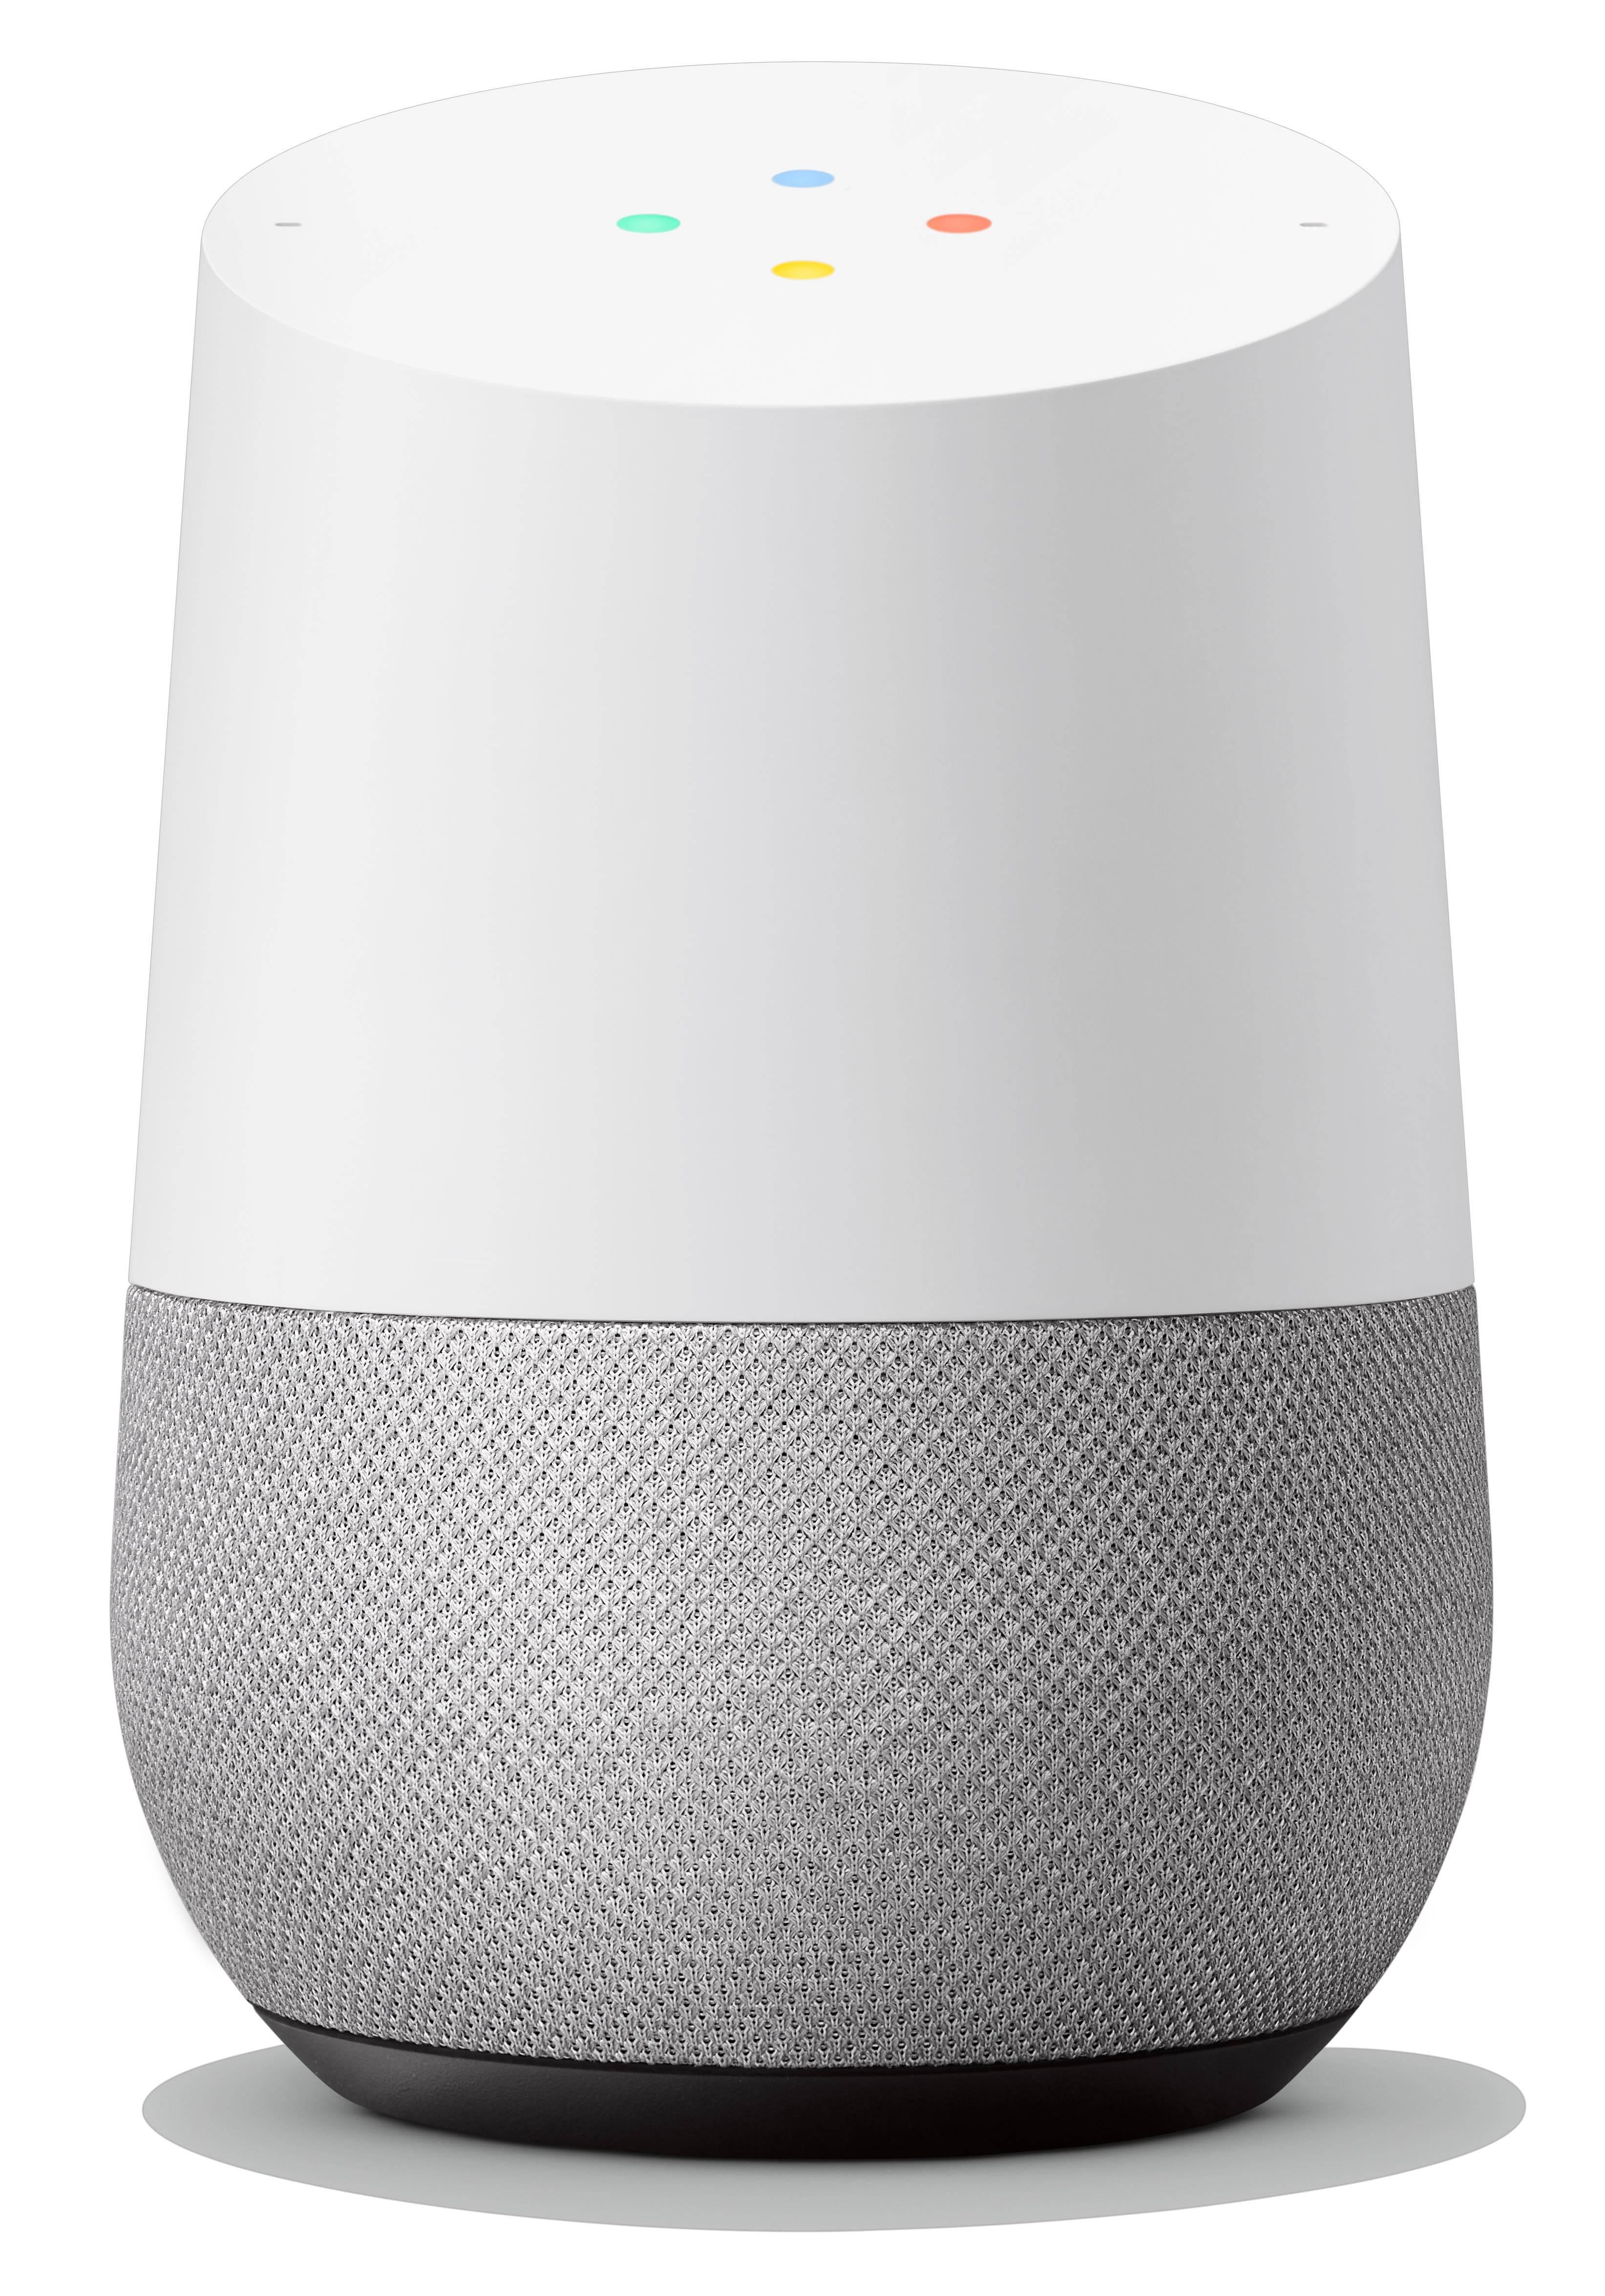 Google Home Smart Speaker Google Assistant E Smart Apple Speakers Gamingkeyboard Smartwatch Beats Ga Google Home Smart Speaker Google Home Assistant